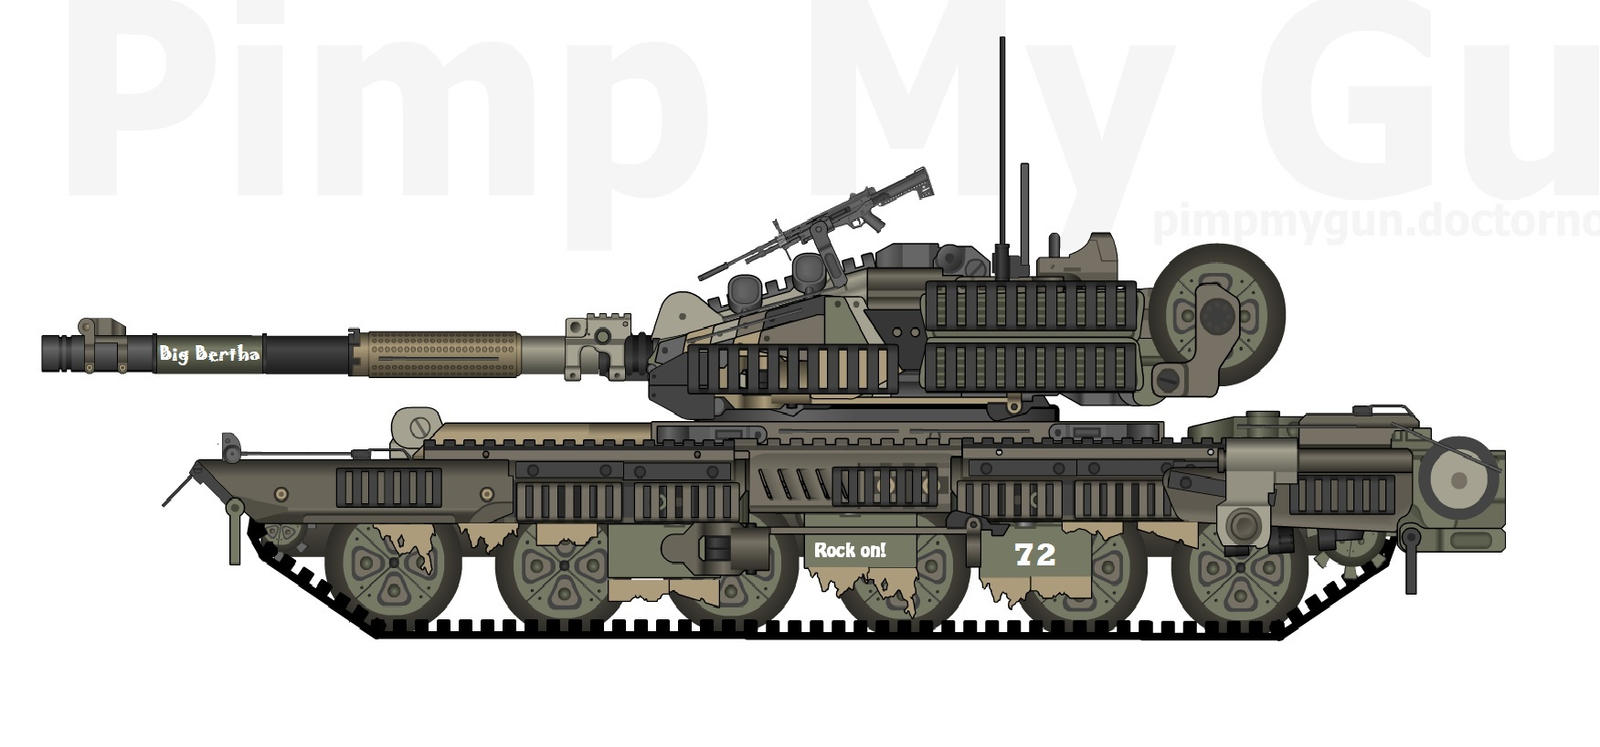 RA-89 Heavy Tank by dirtbiker715